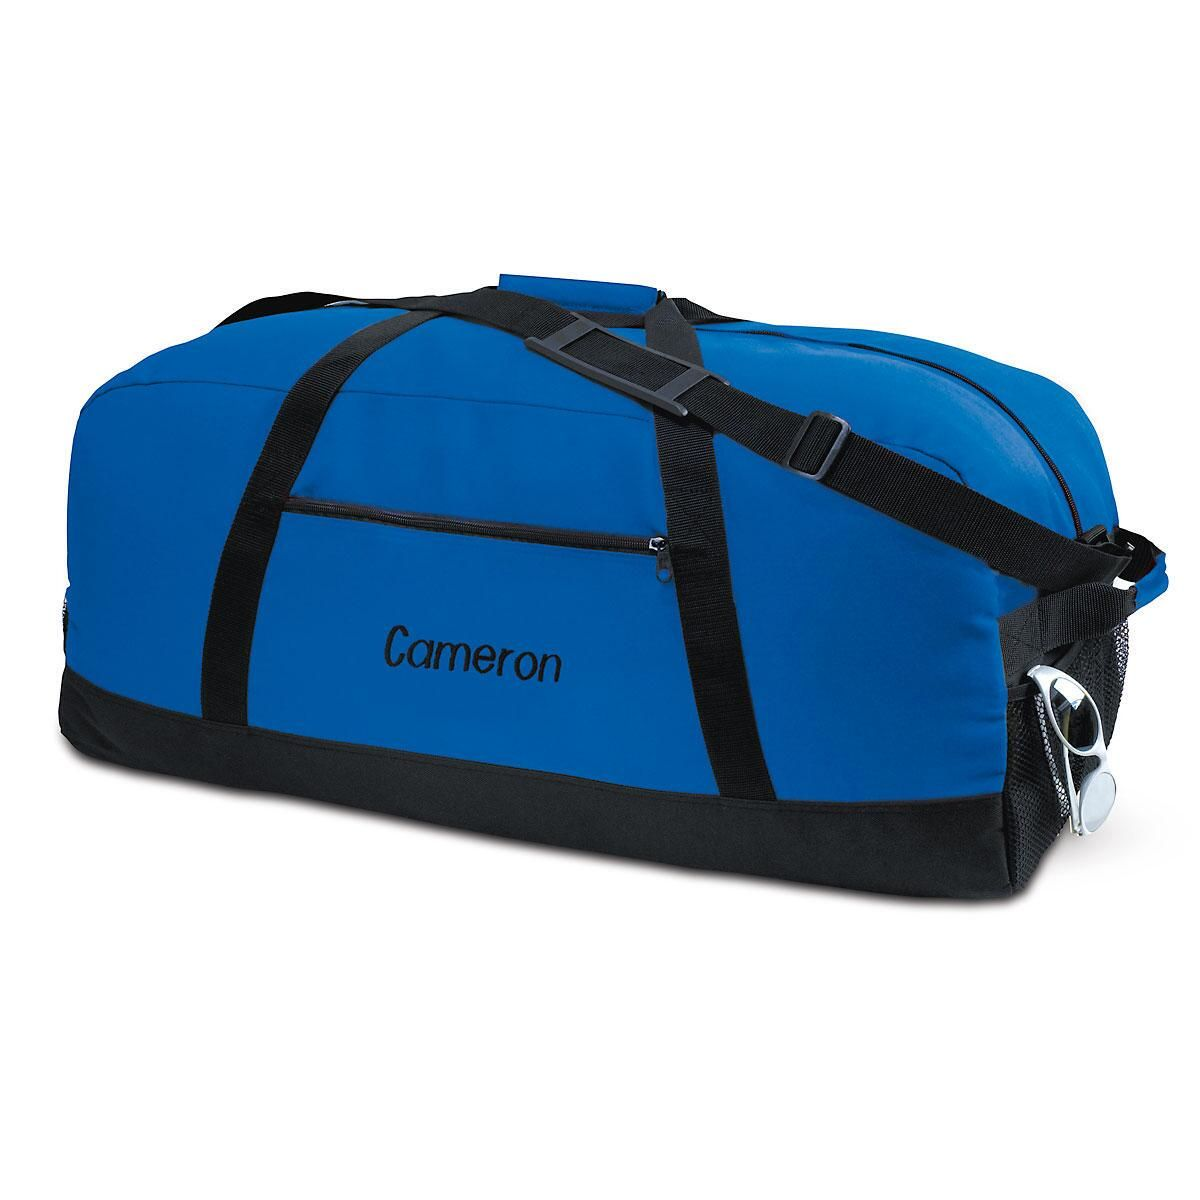 Blue and Black Duffel Bag